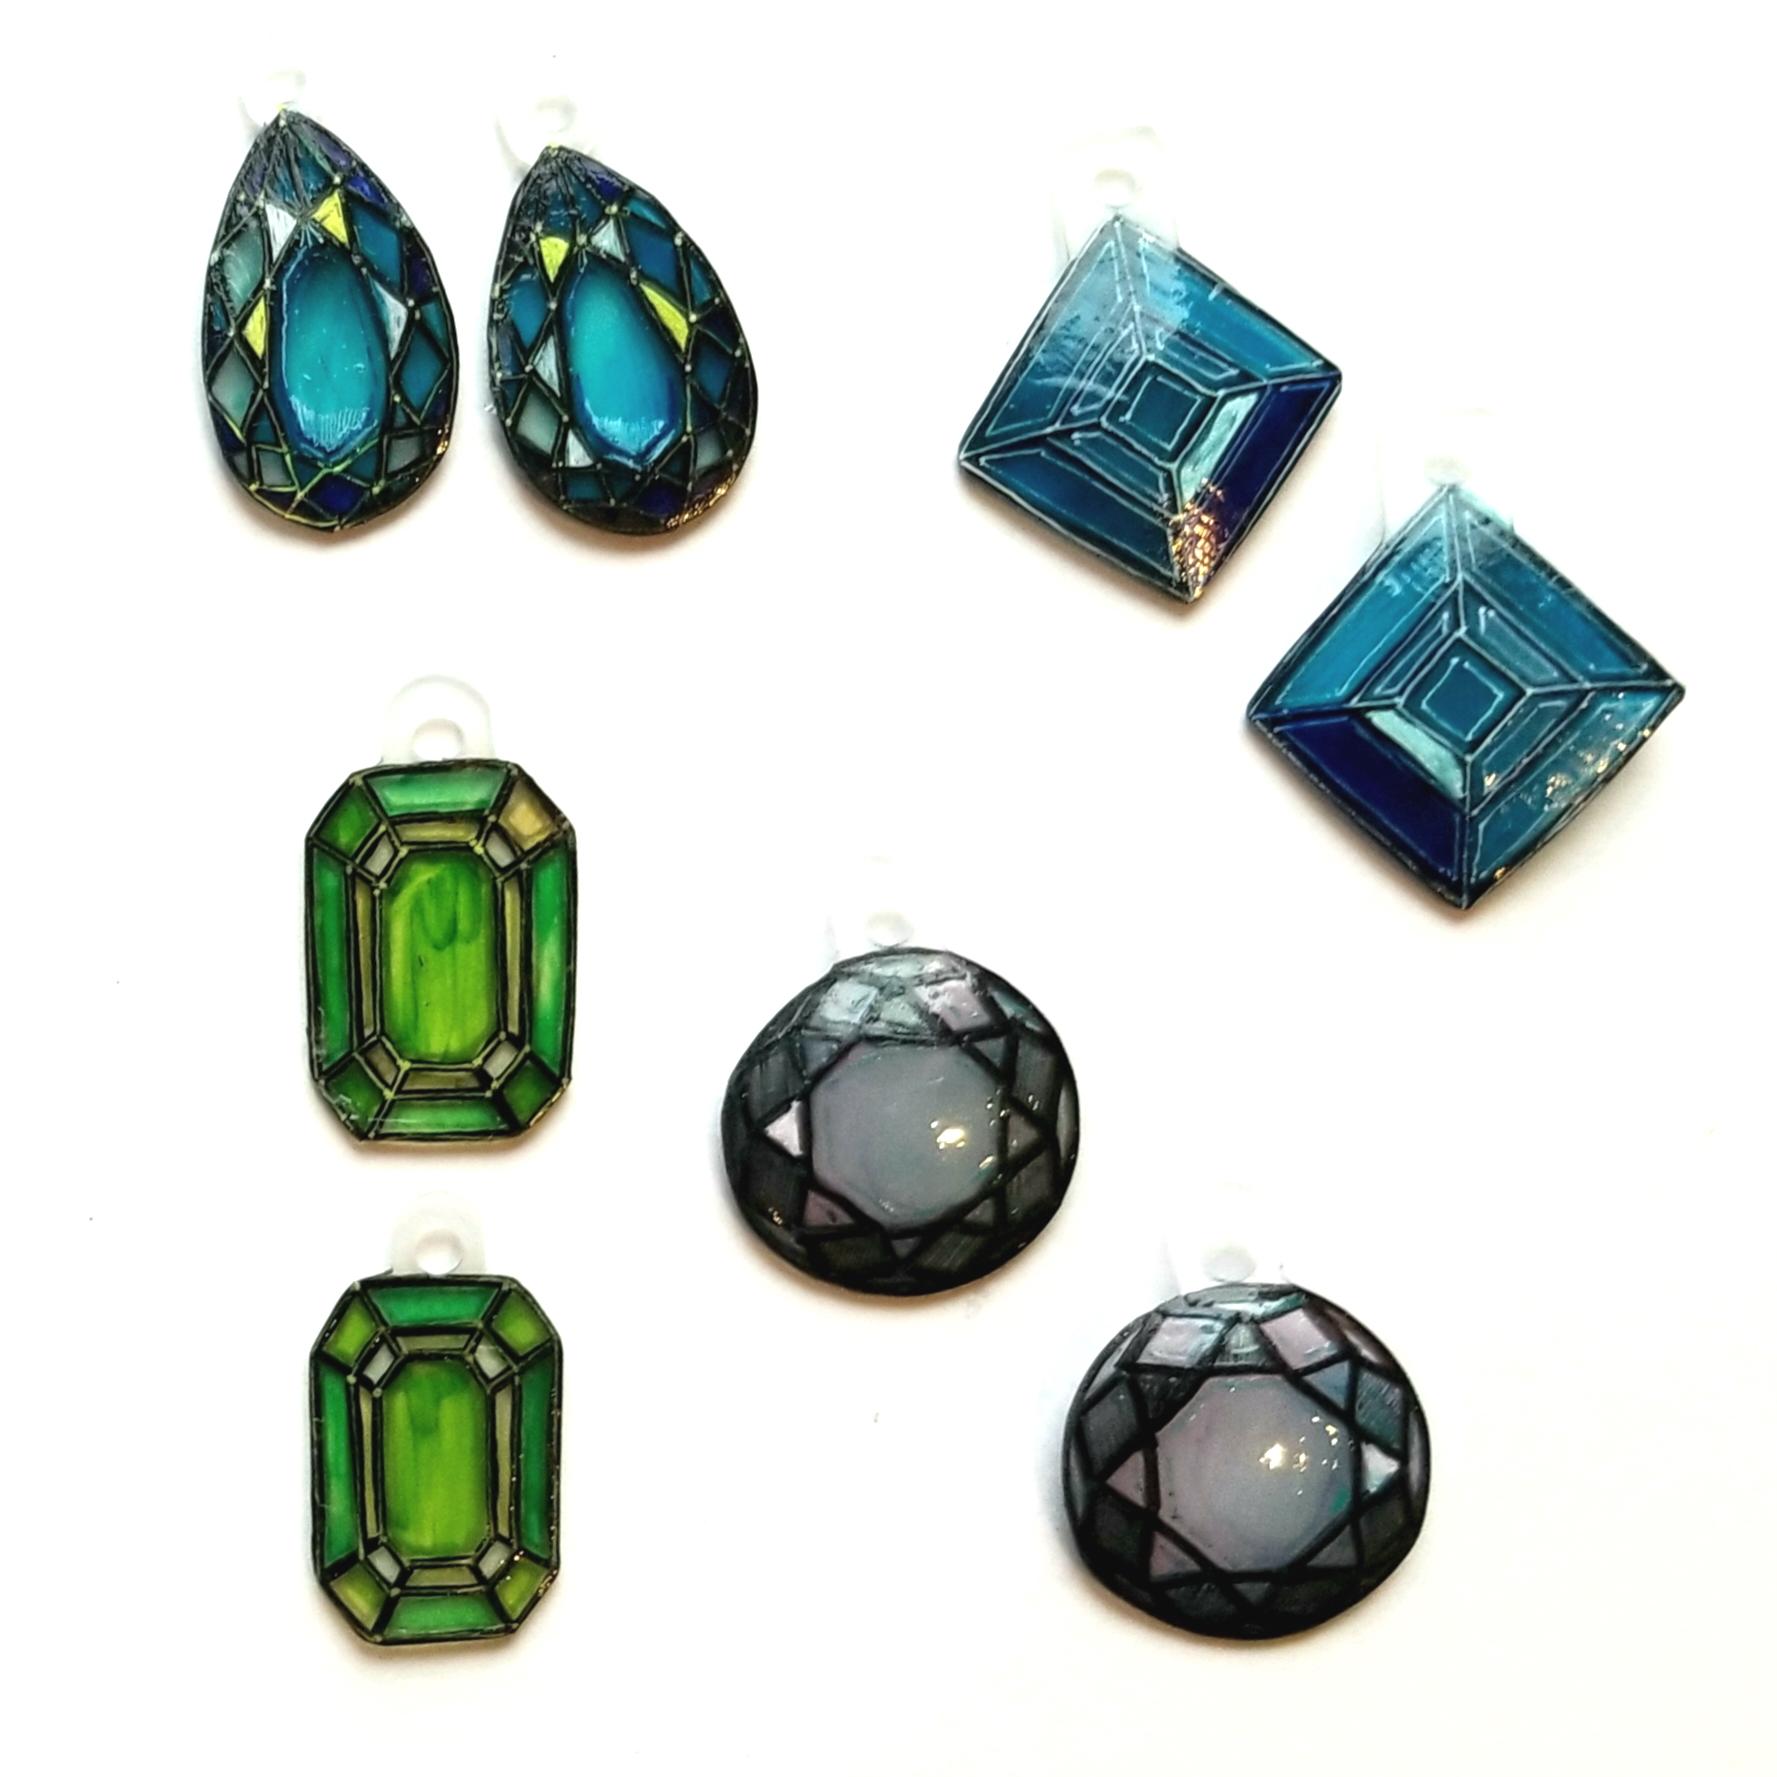 Gems earrings, shrunk